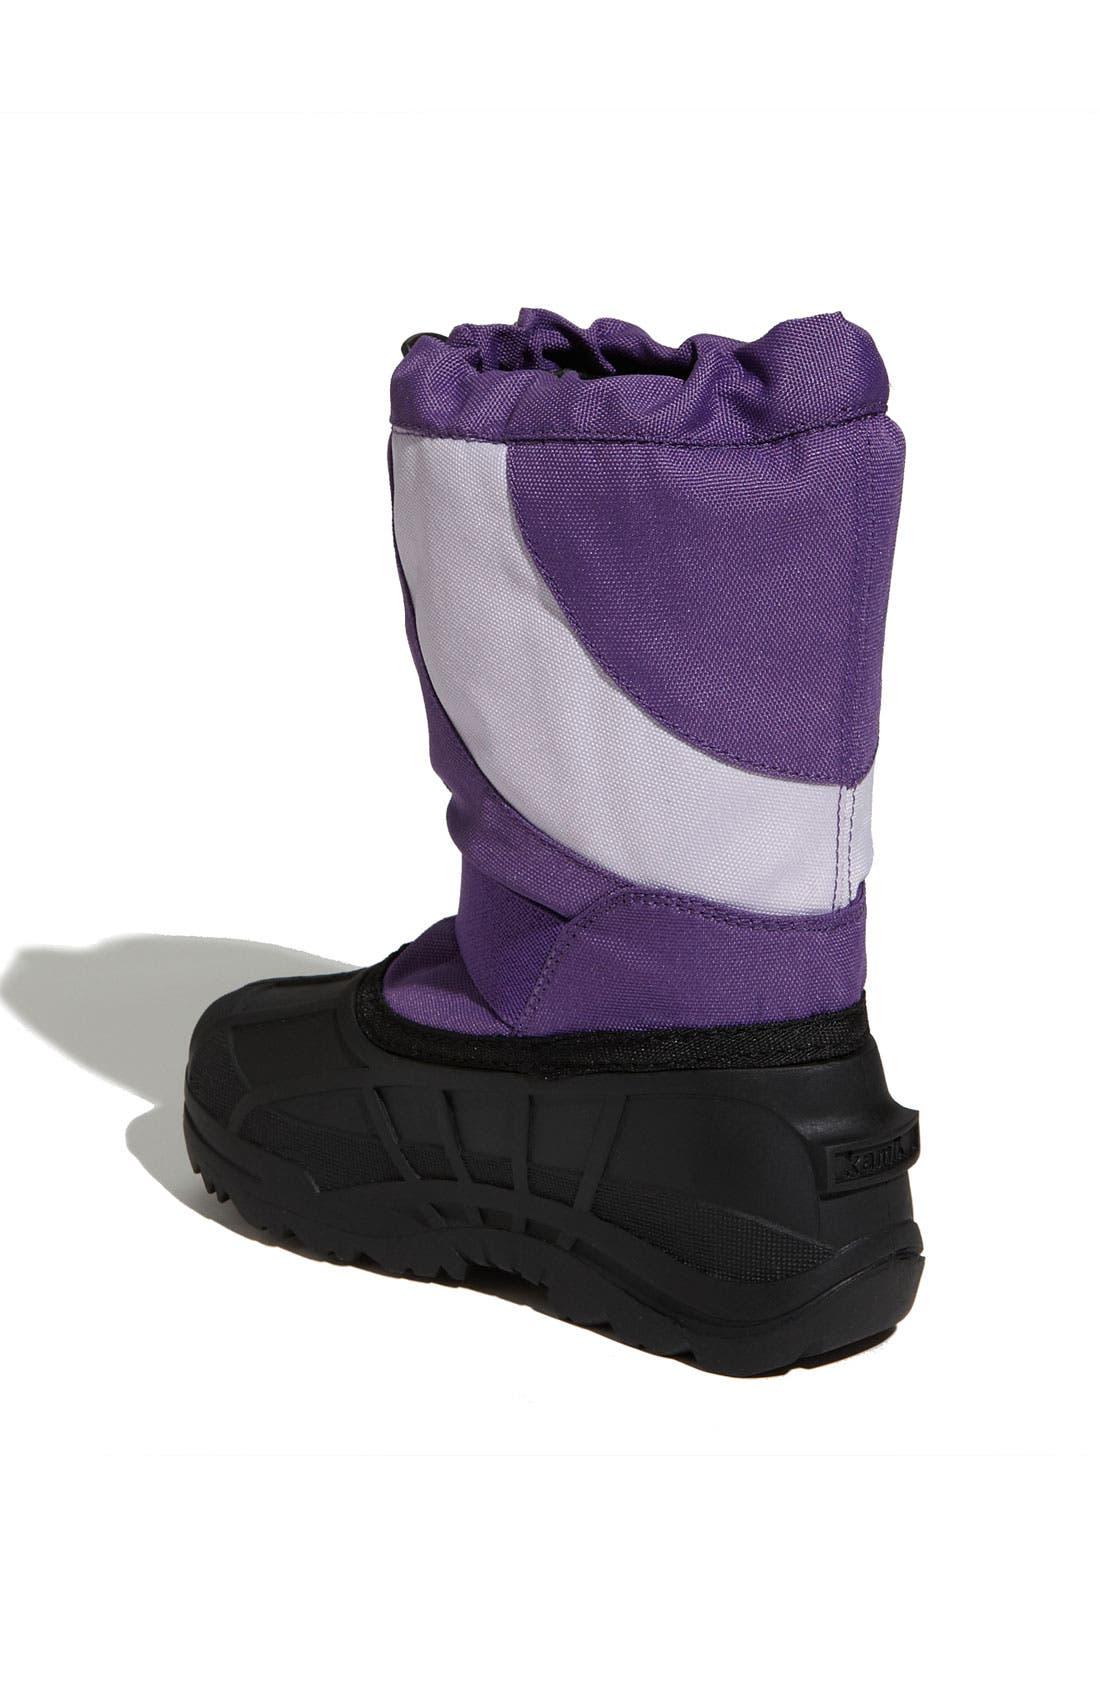 Alternate Image 2  - Kamik 'Fireball' Weatherproof Boot (Toddler, Little Kid & Big Kid)